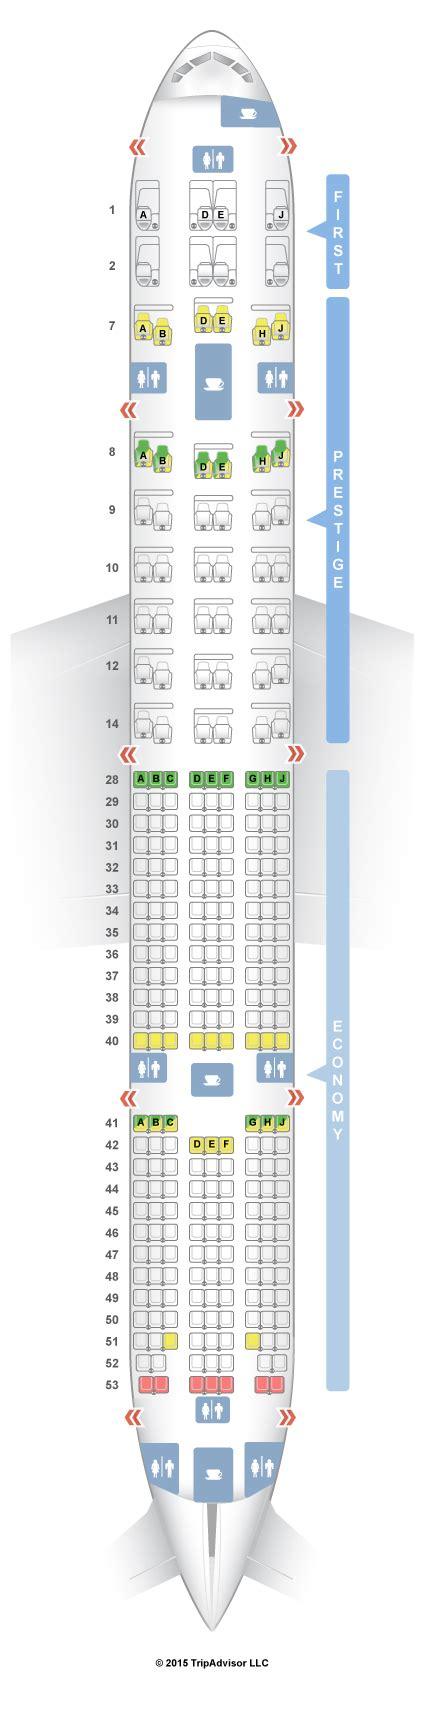 korean air seat seatguru seat map korean air boeing 777 300er 77w v1